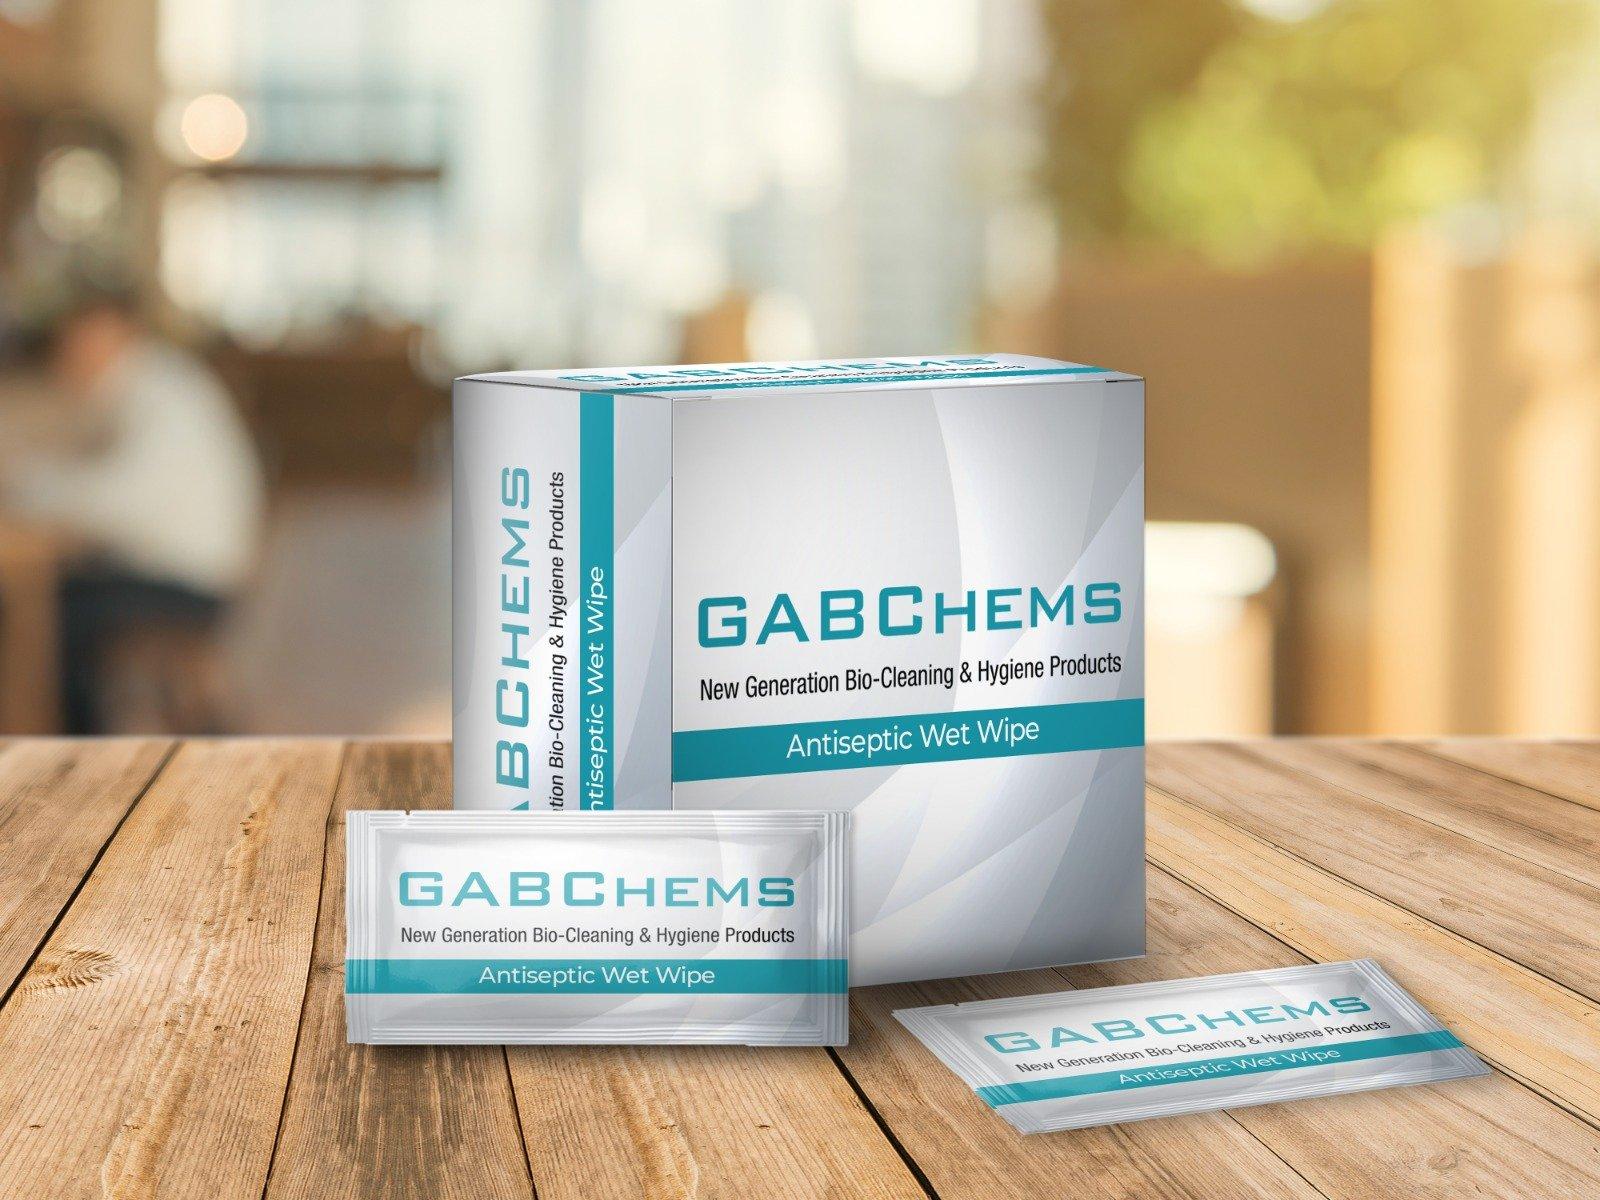 Gabchems